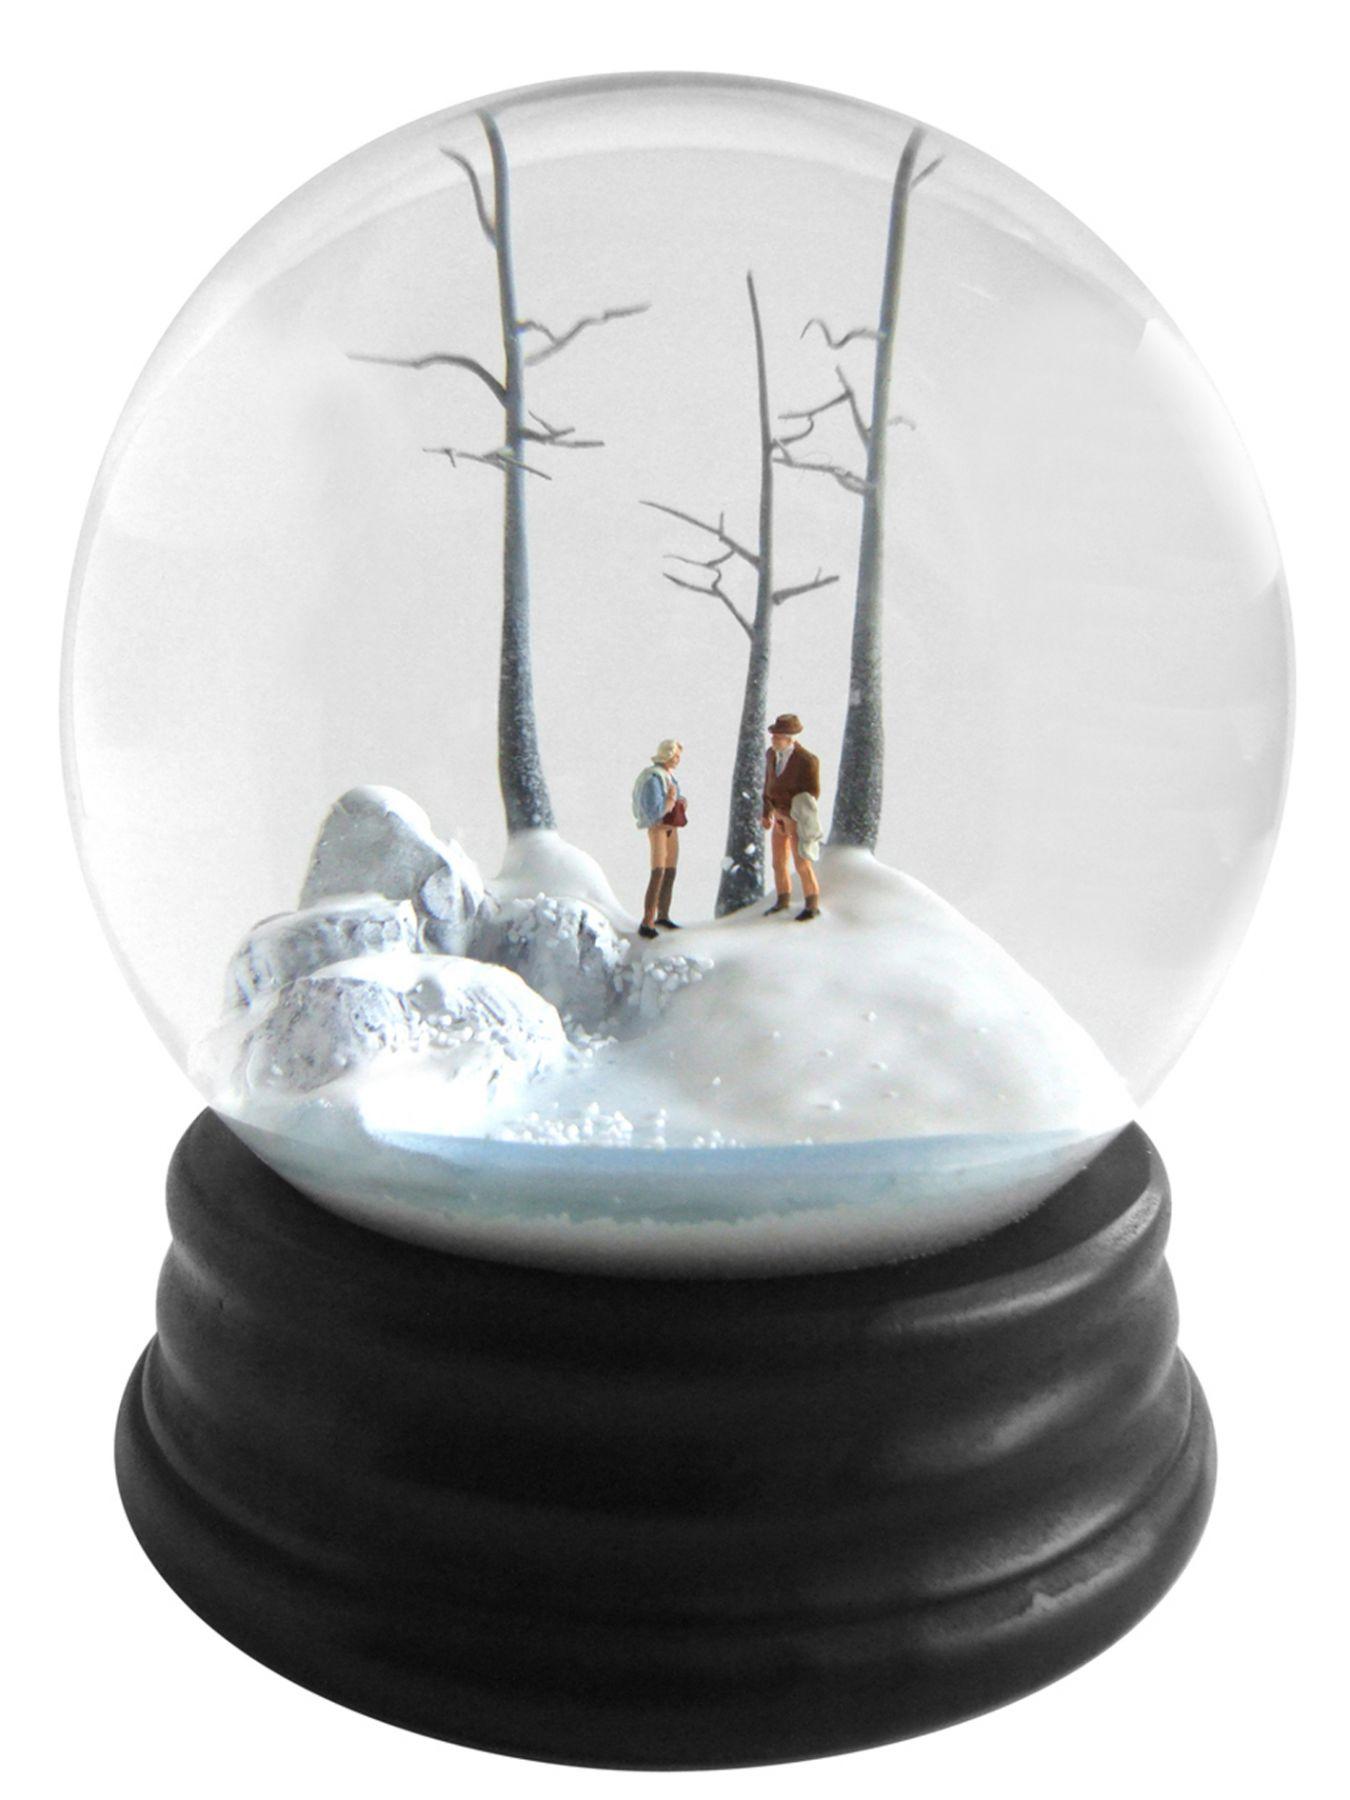 Walter Martin & Paloma Munoz, Traveler CCLVIII (258), 2012, glass, wood, water and plastic, 9 x 6 x 6 inches